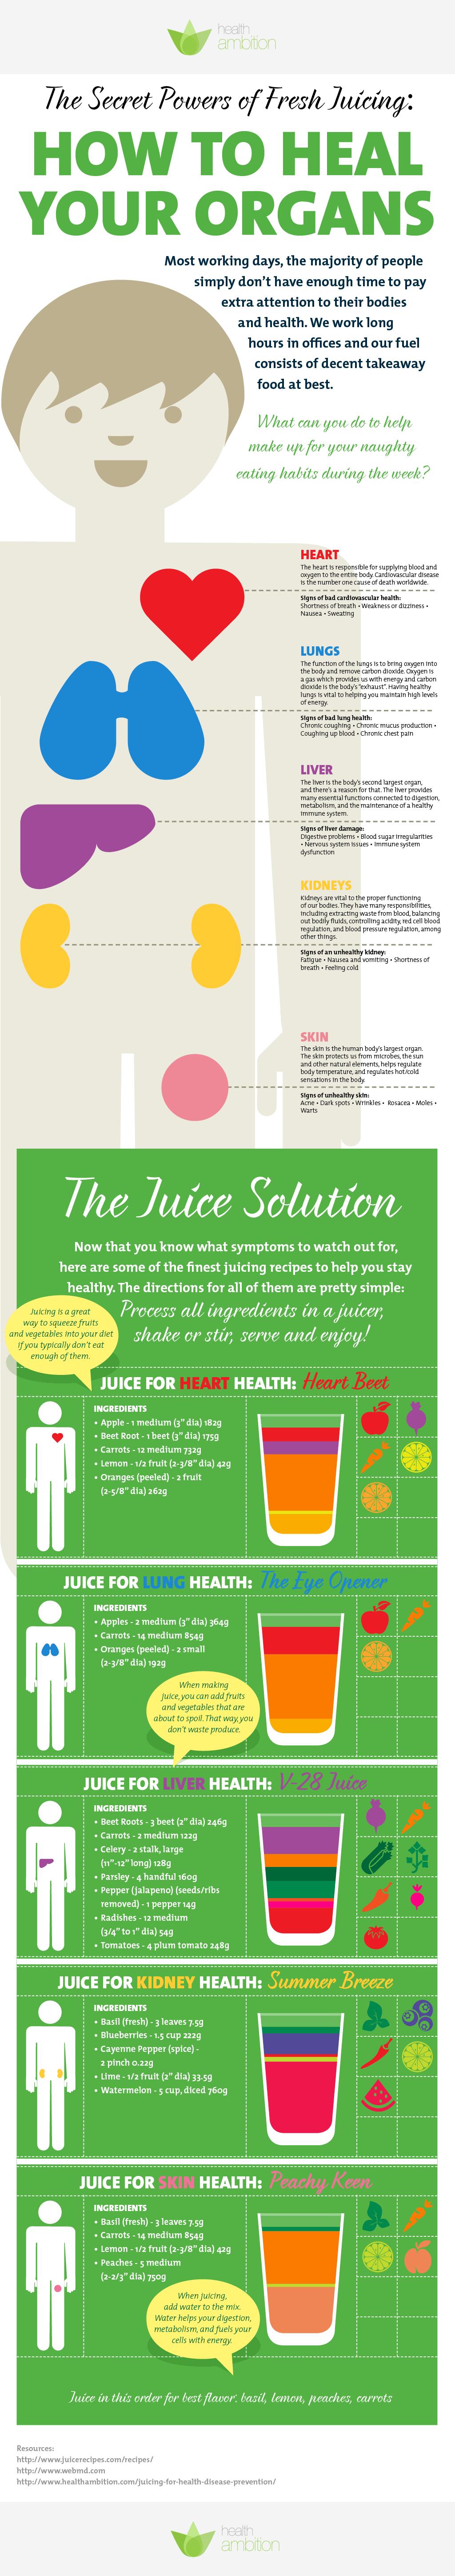 Juicing Juice Smoothies And Remedies - Secret benefits drinking apple juice